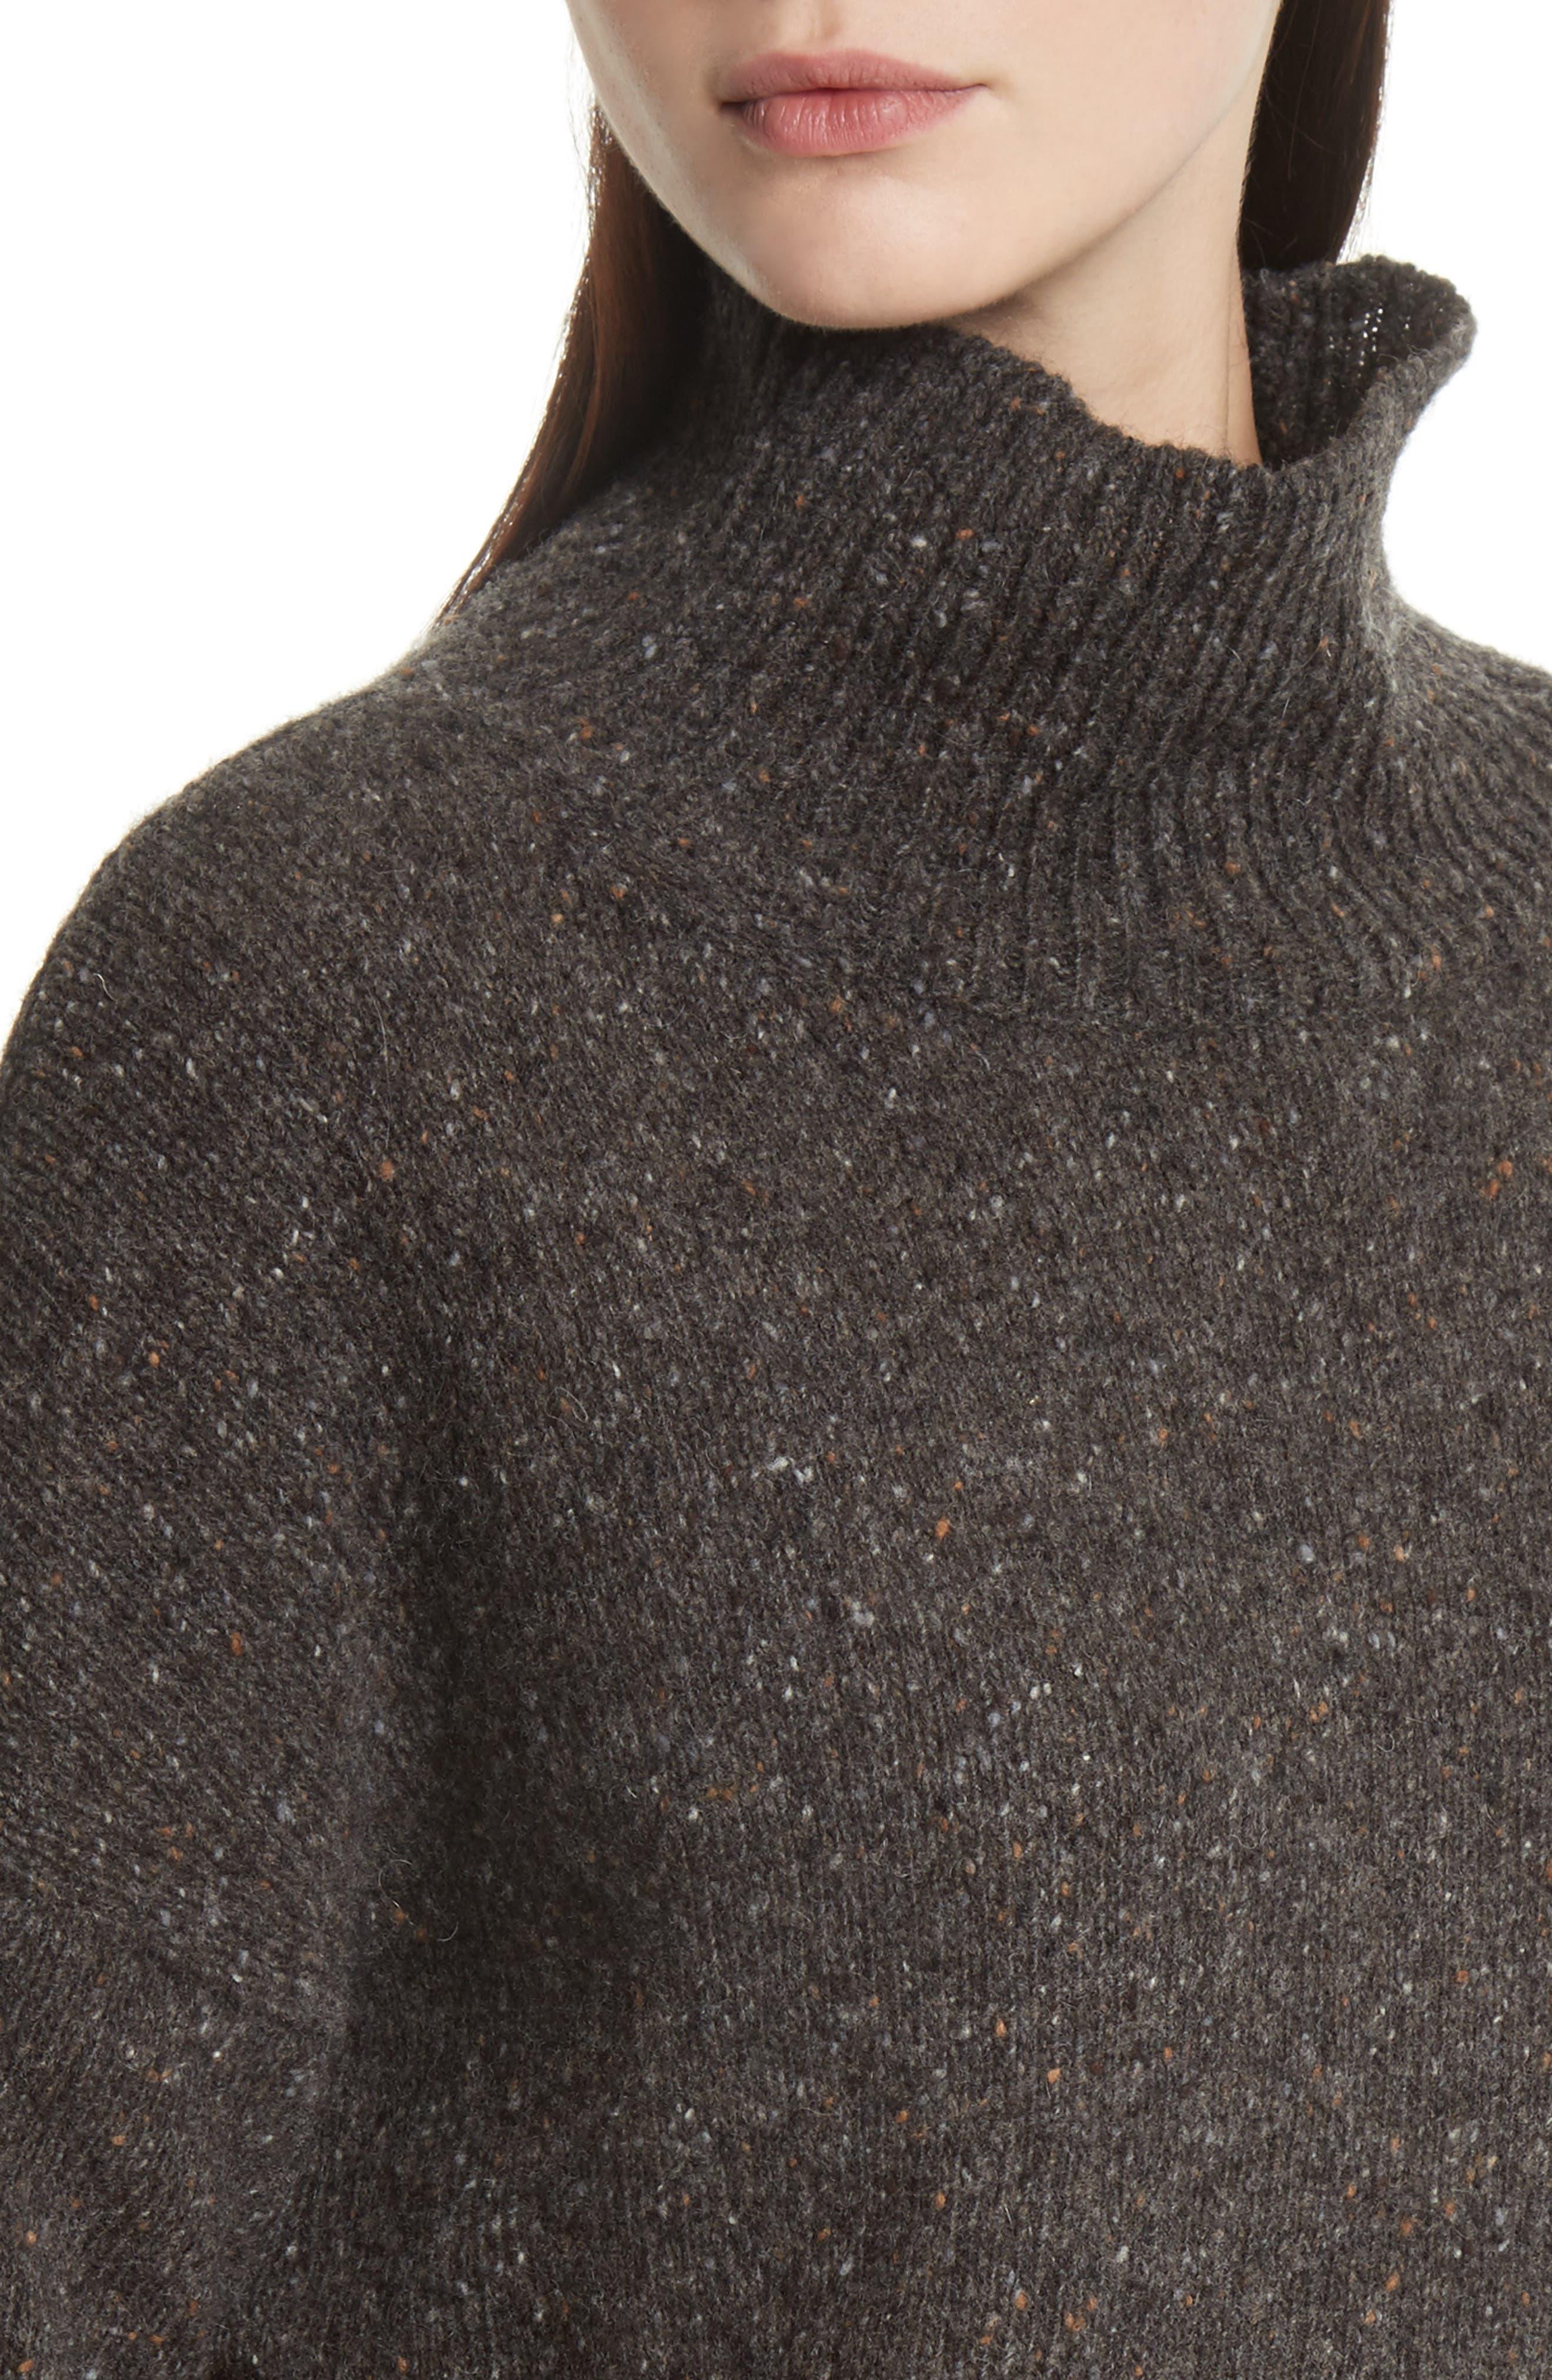 Cashmere Turtleneck Sweater,                             Alternate thumbnail 4, color,                             Charcoal